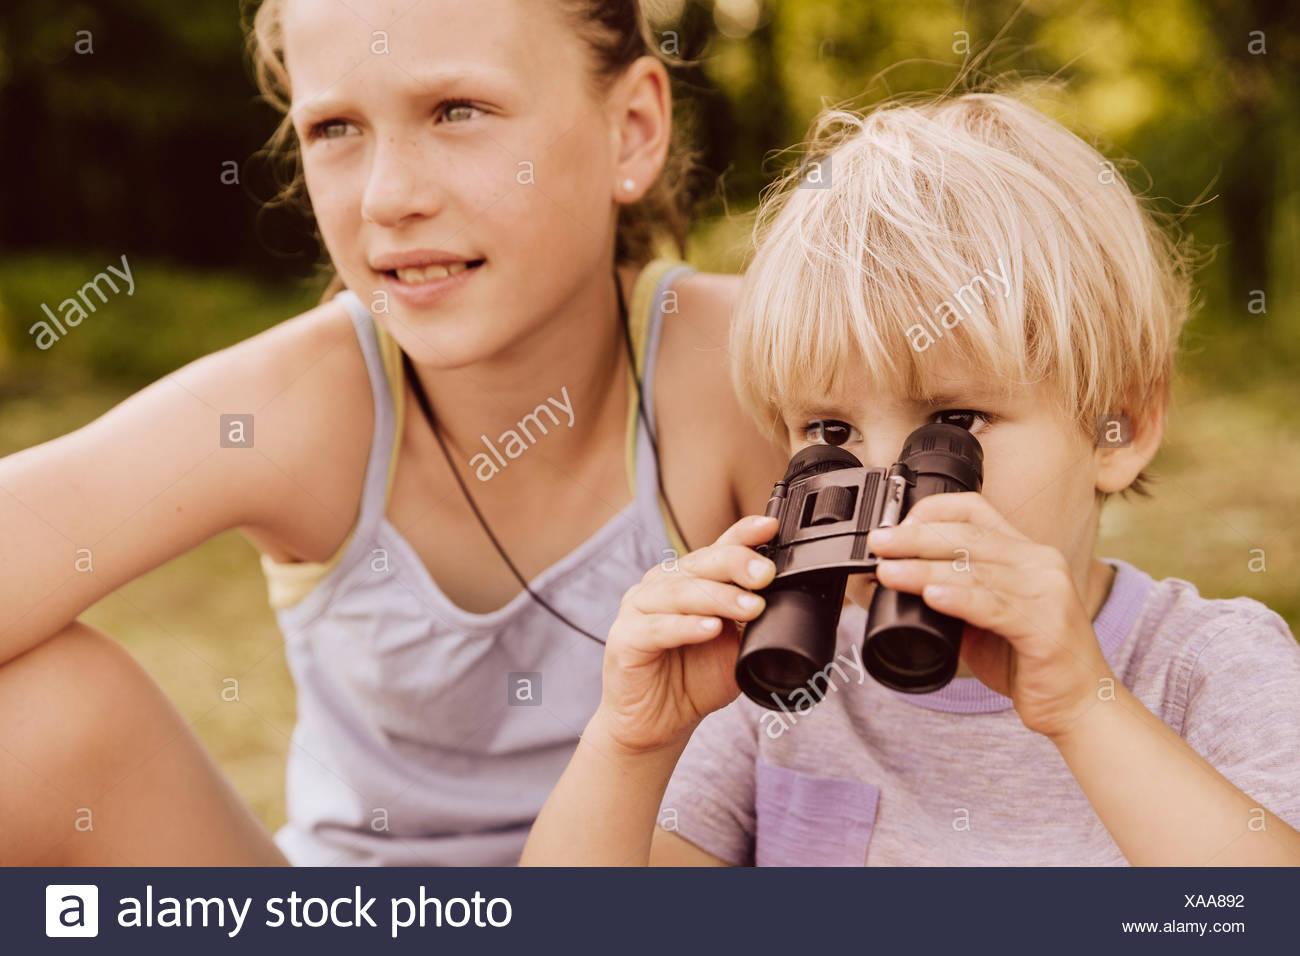 Boy looking through binoculars with his sister - Stock Image